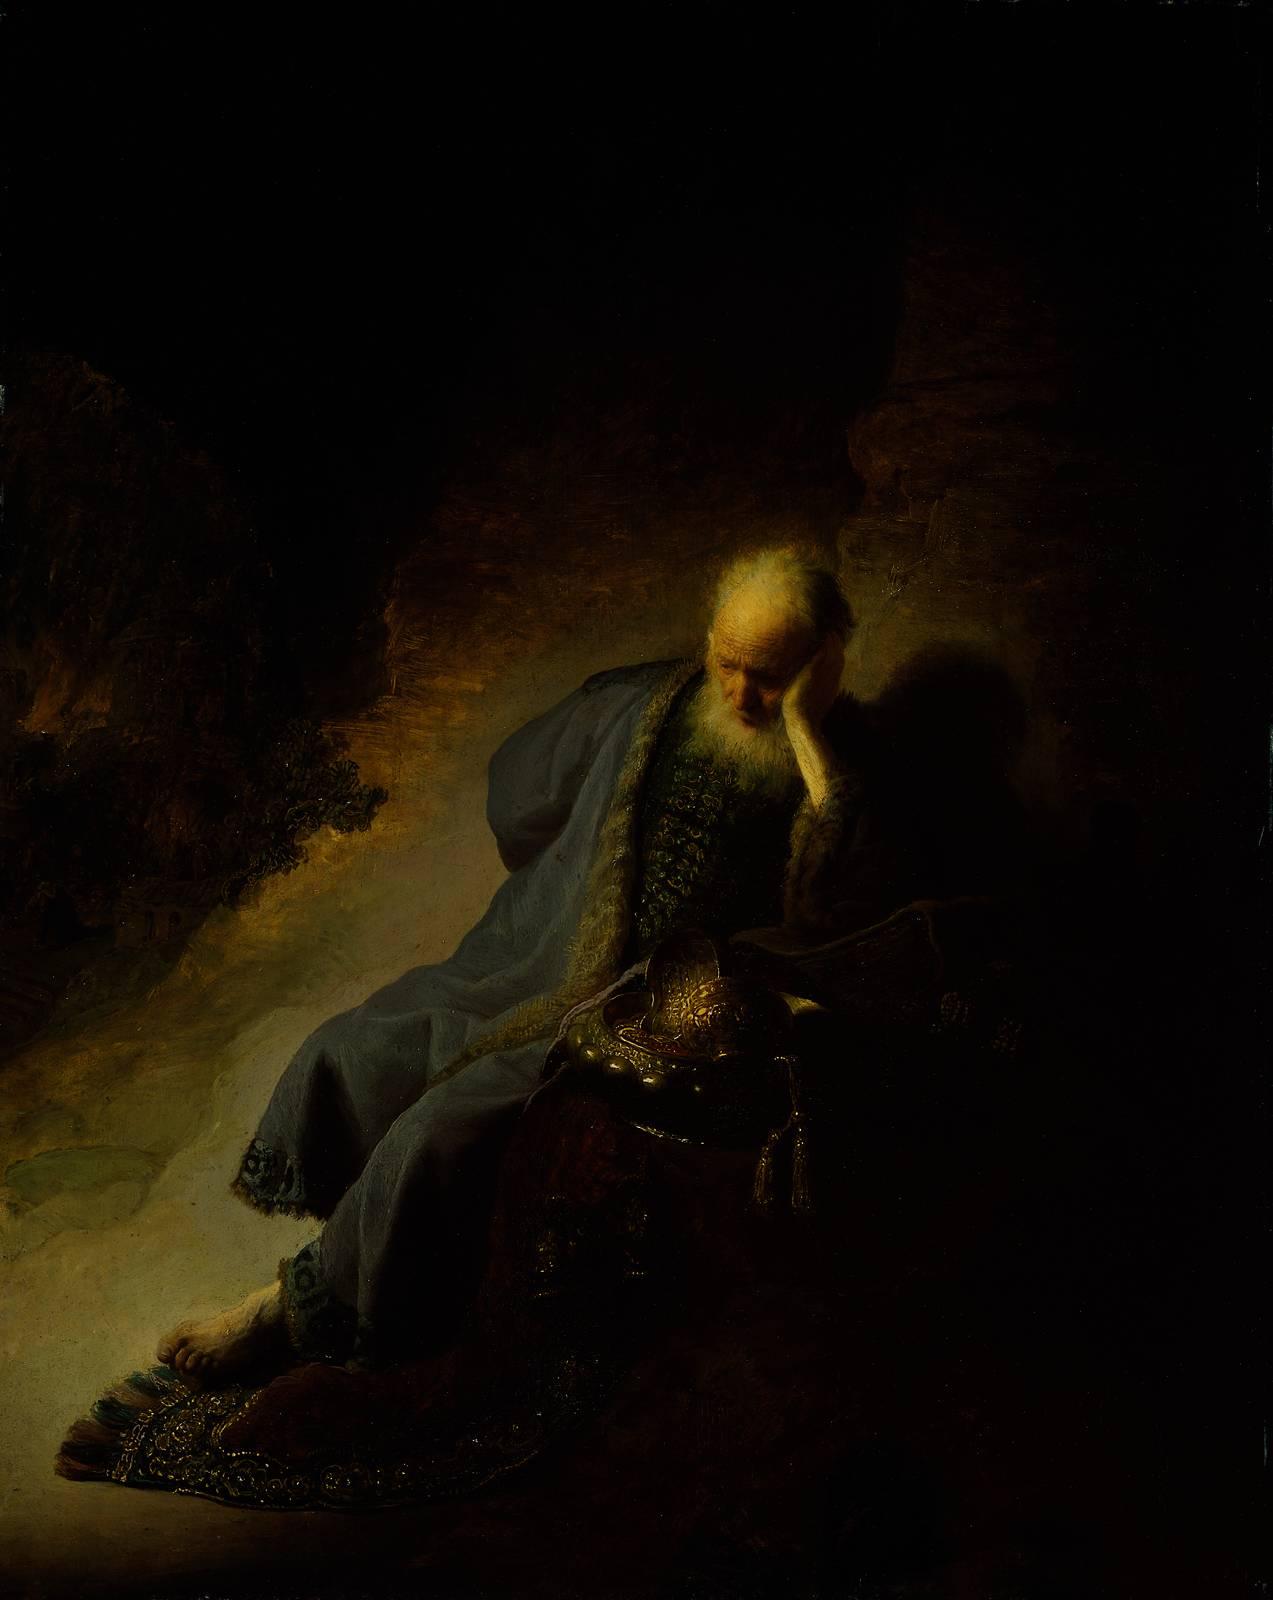 Bruinja-Rembrandt